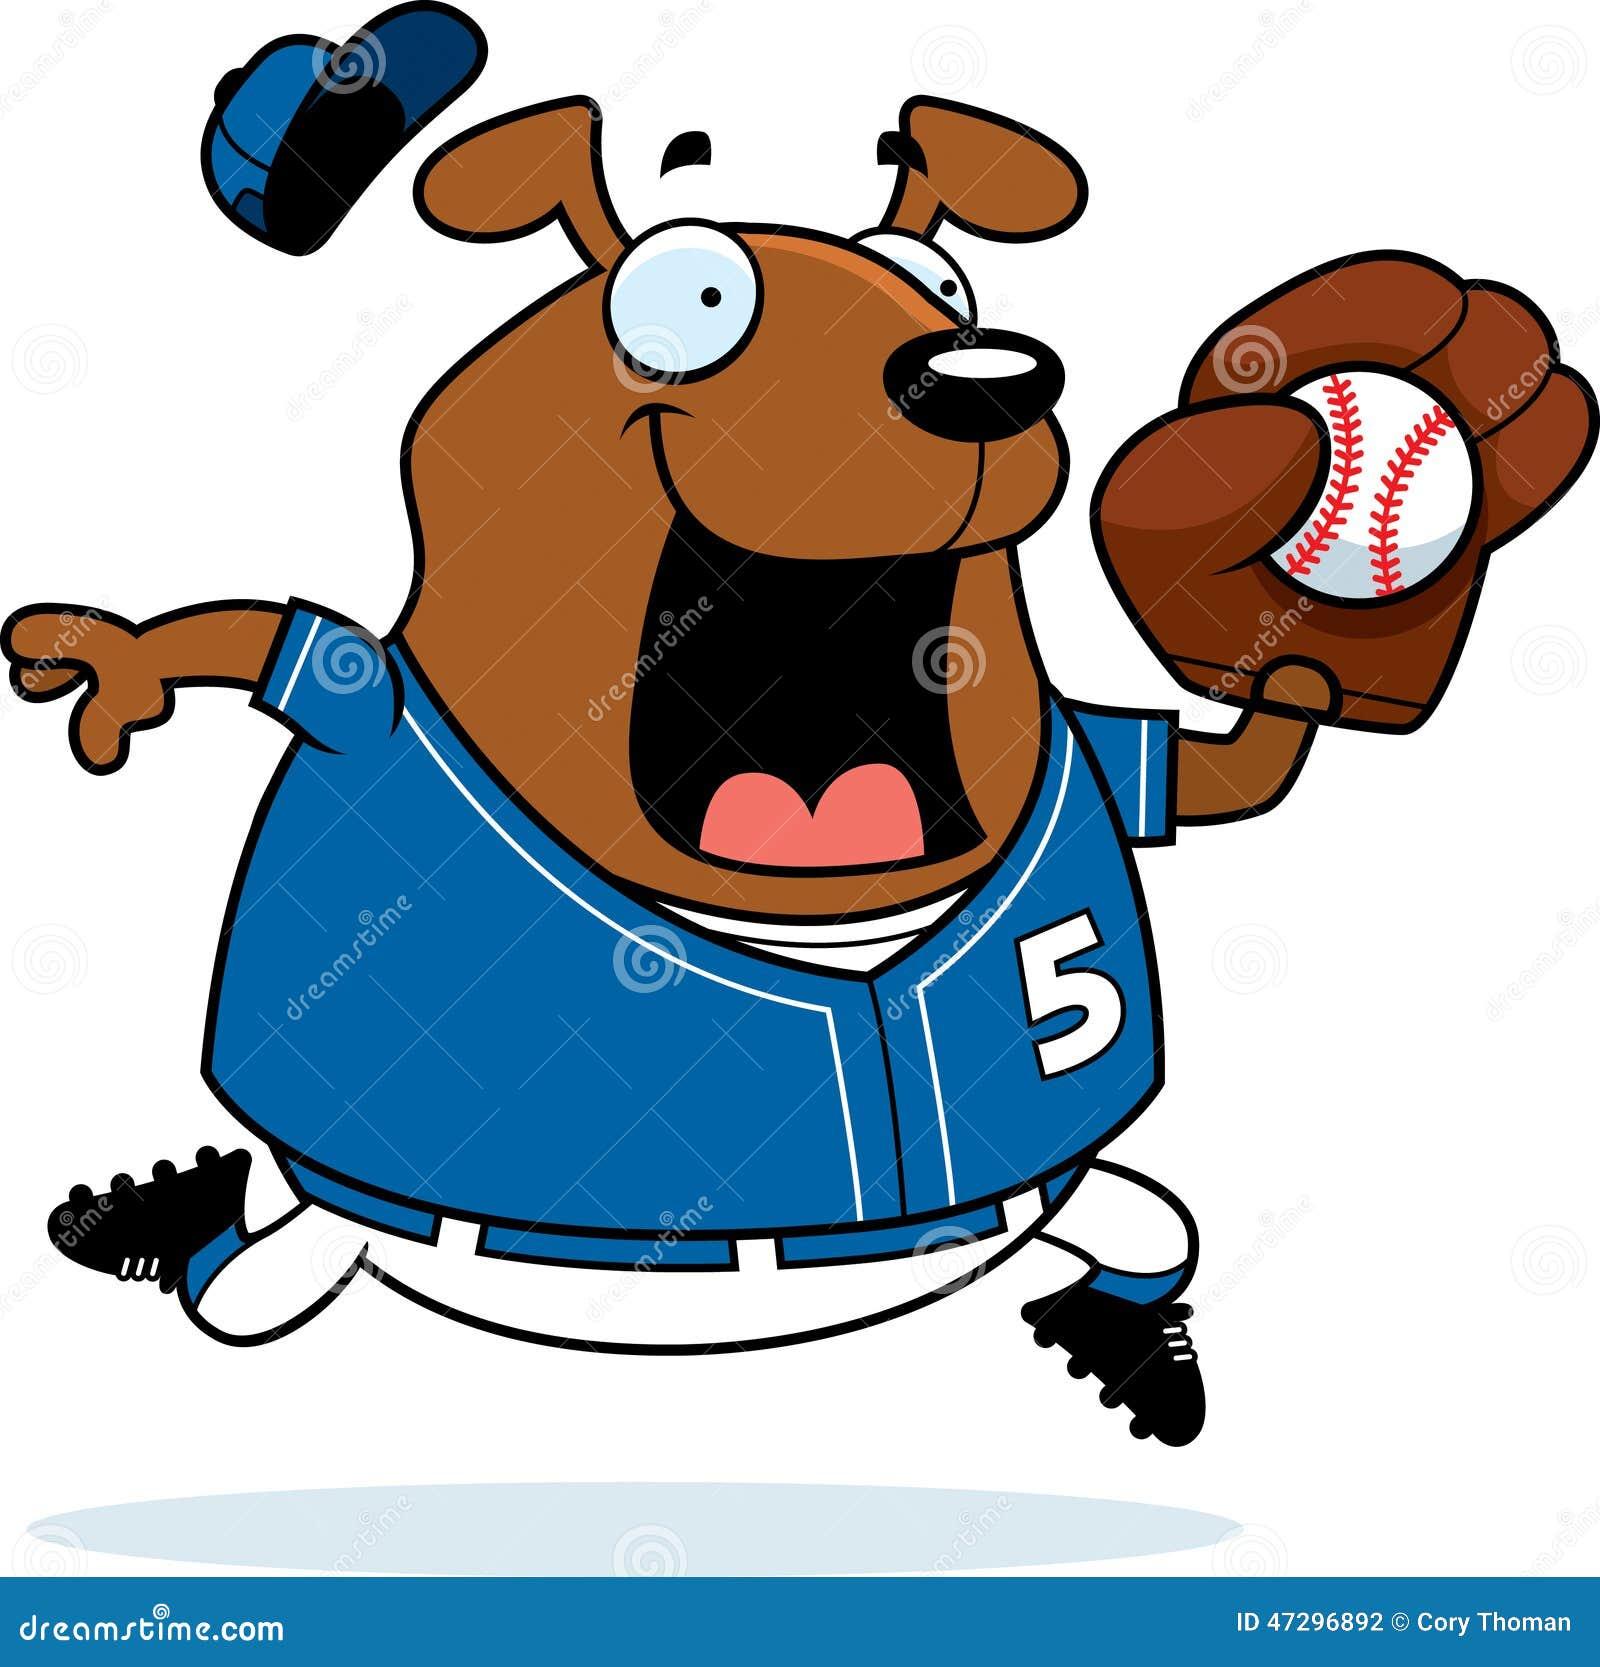 a cartoon illustration of a dog playing baseball